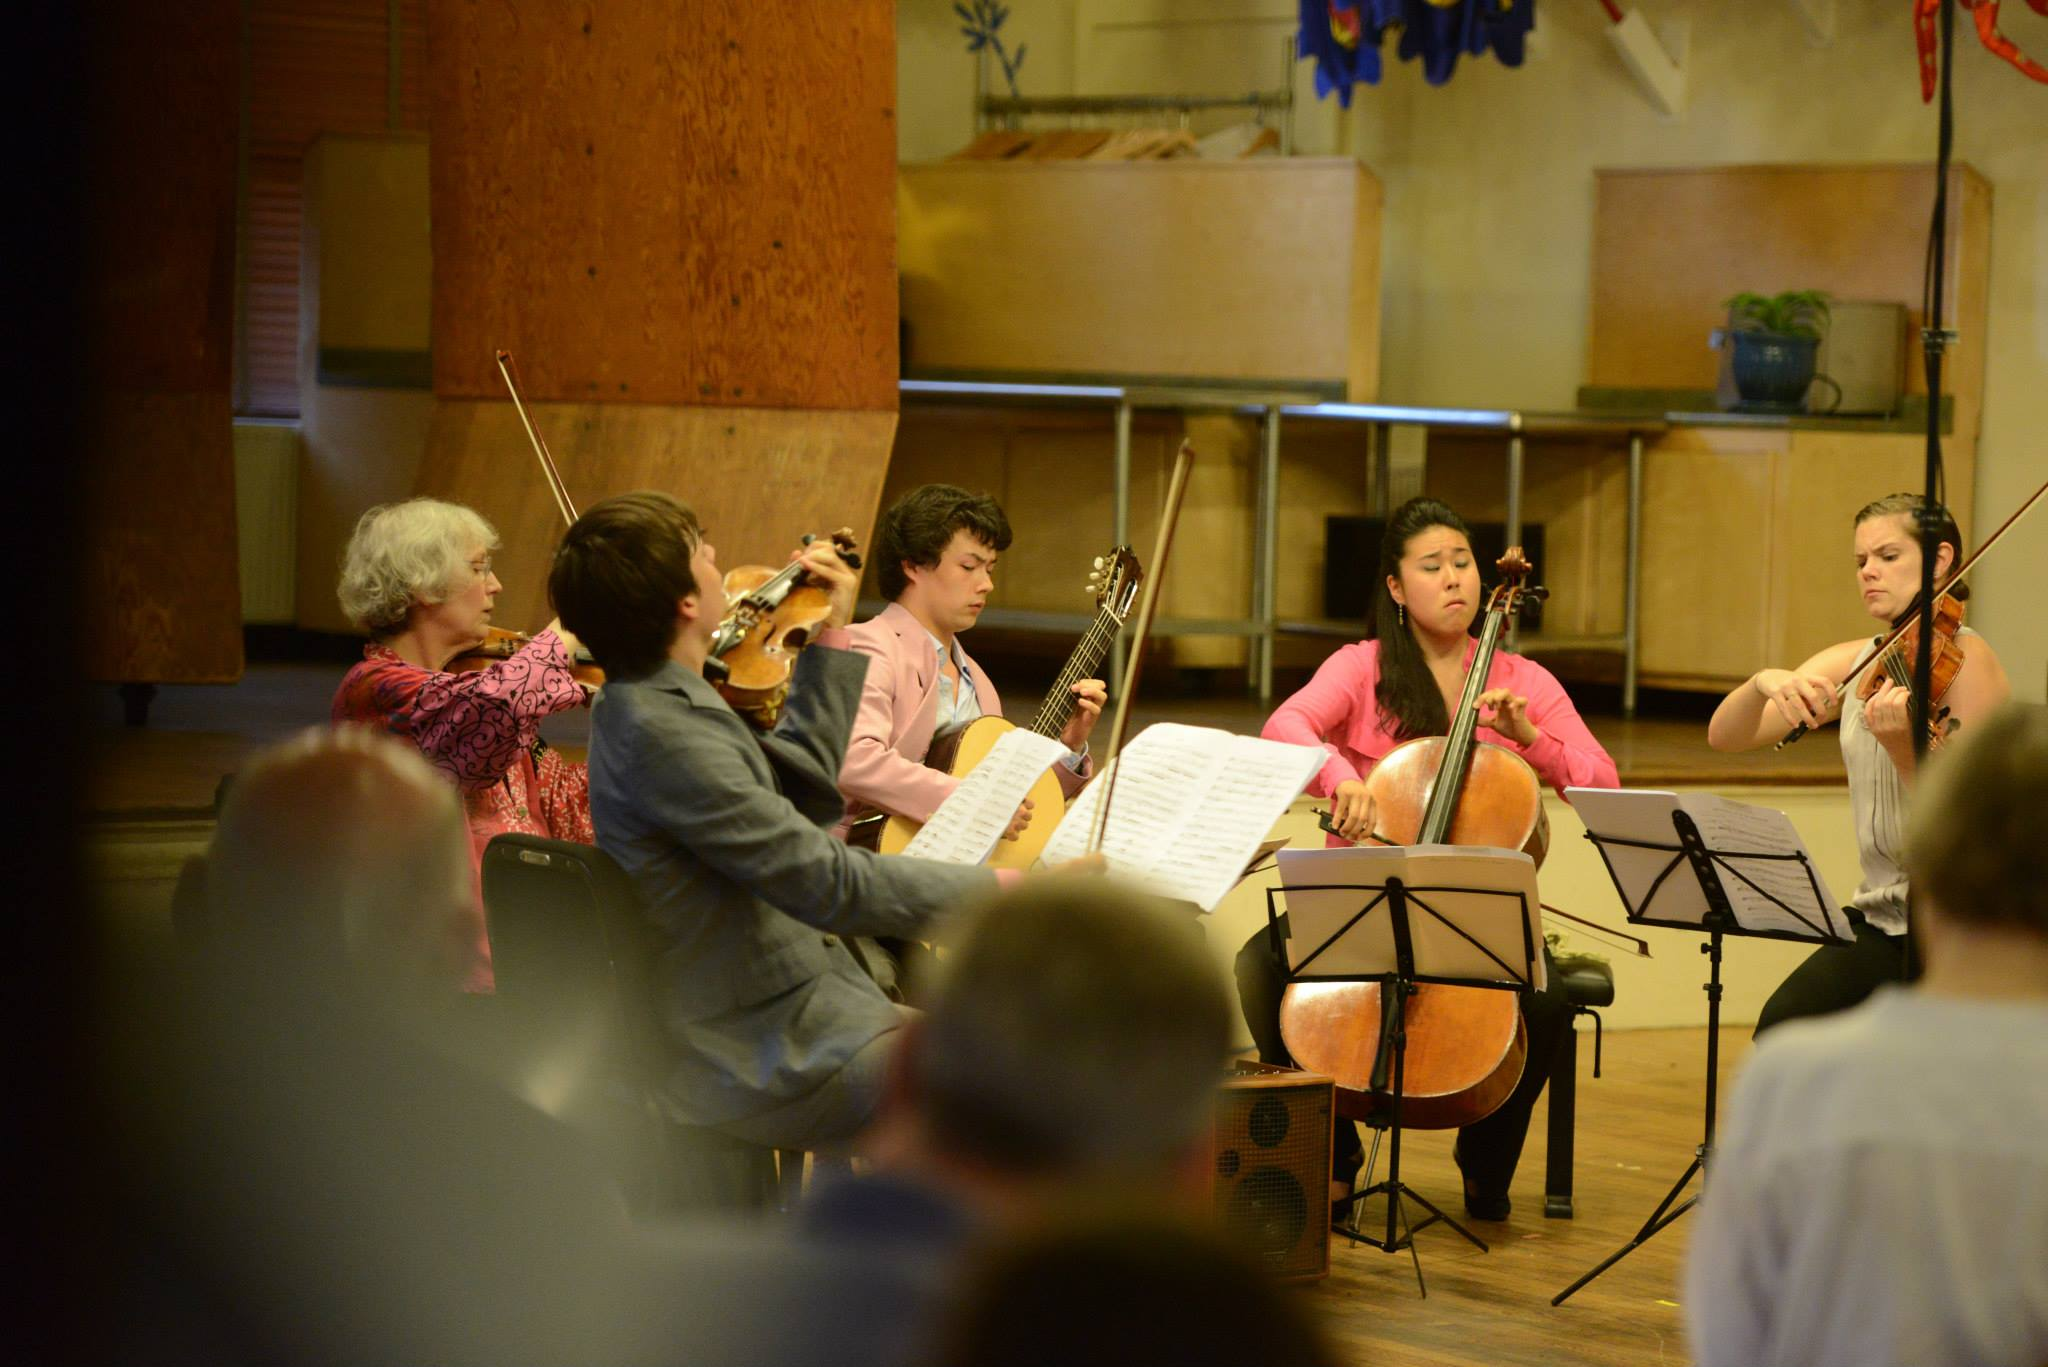 Marlboro Festival  ||  Boccherini 'Fandago' Quintet with Francisco Fullana, Lucy Chapman, Sean Shibe, and Megan Griffin (2013)